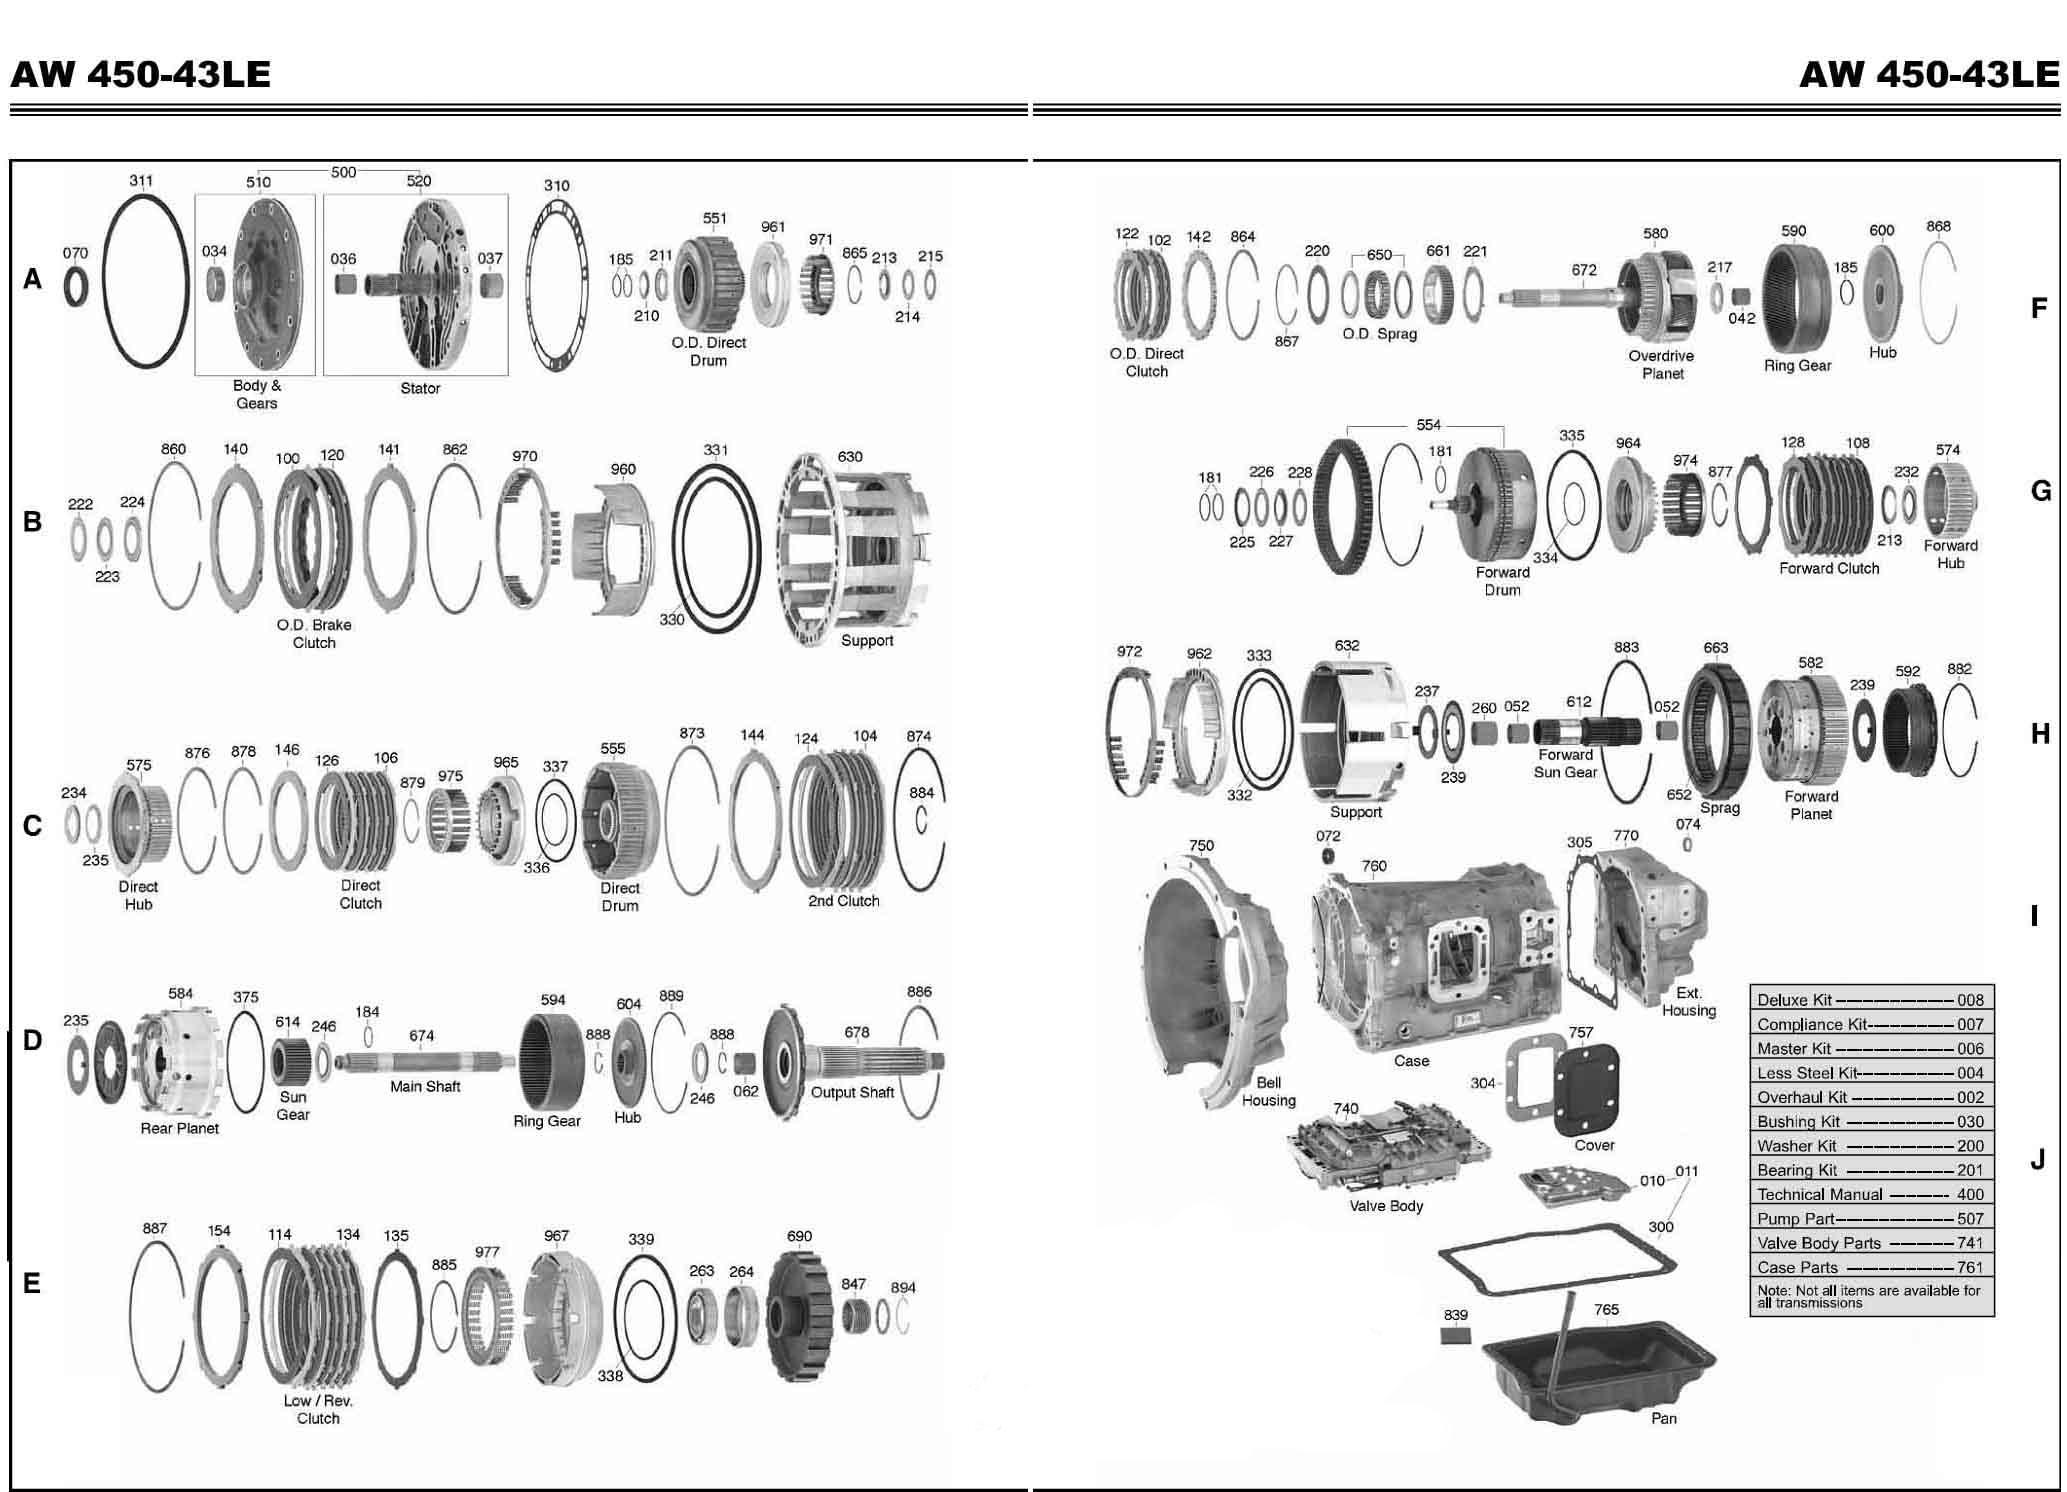 Transmission repair manuals AW 450-43LE | Rebuild instructions